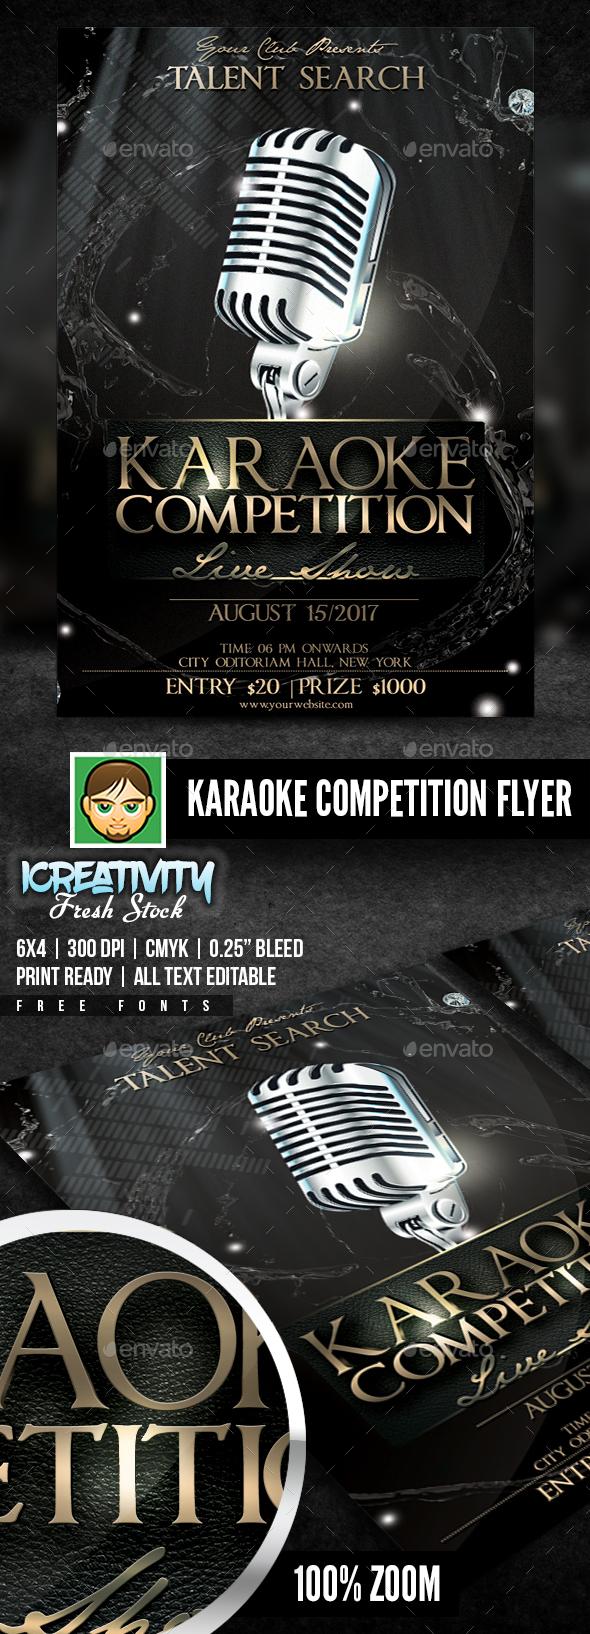 Karaoke Competition Flyer - Flyers Print Templates